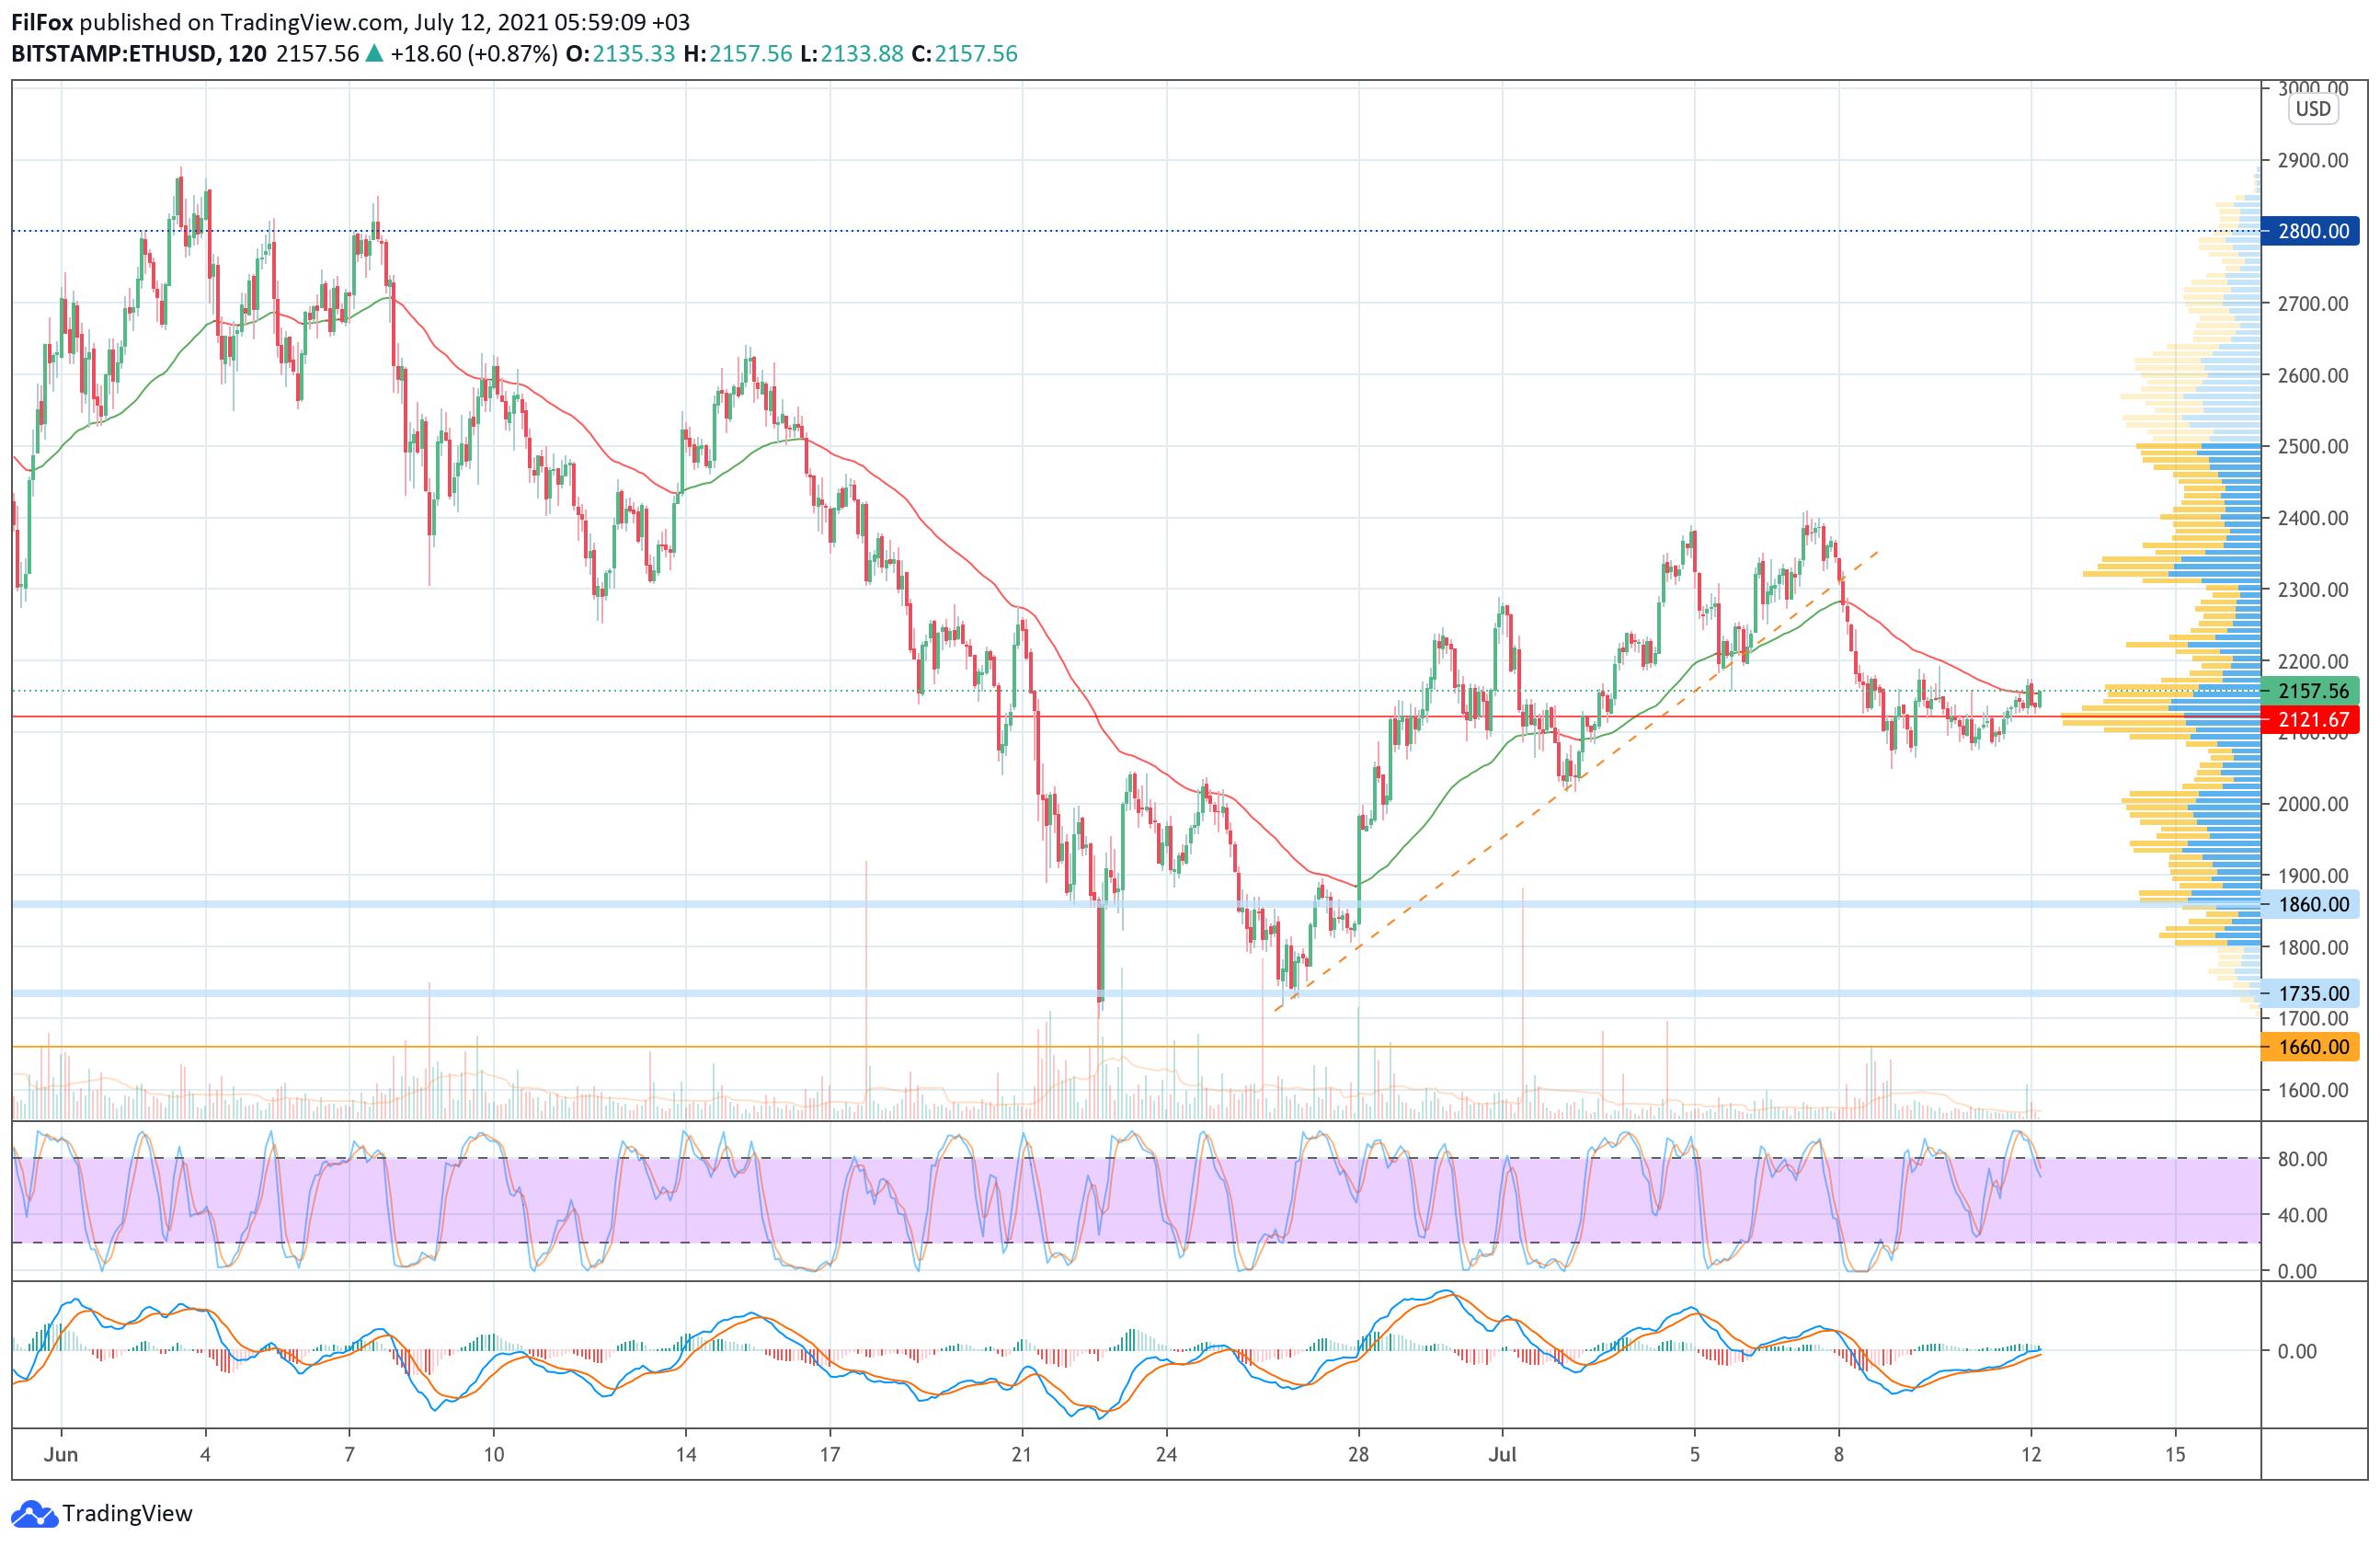 Анализ цен Bitcoin, Ethereum, XRP на 12.07.2021